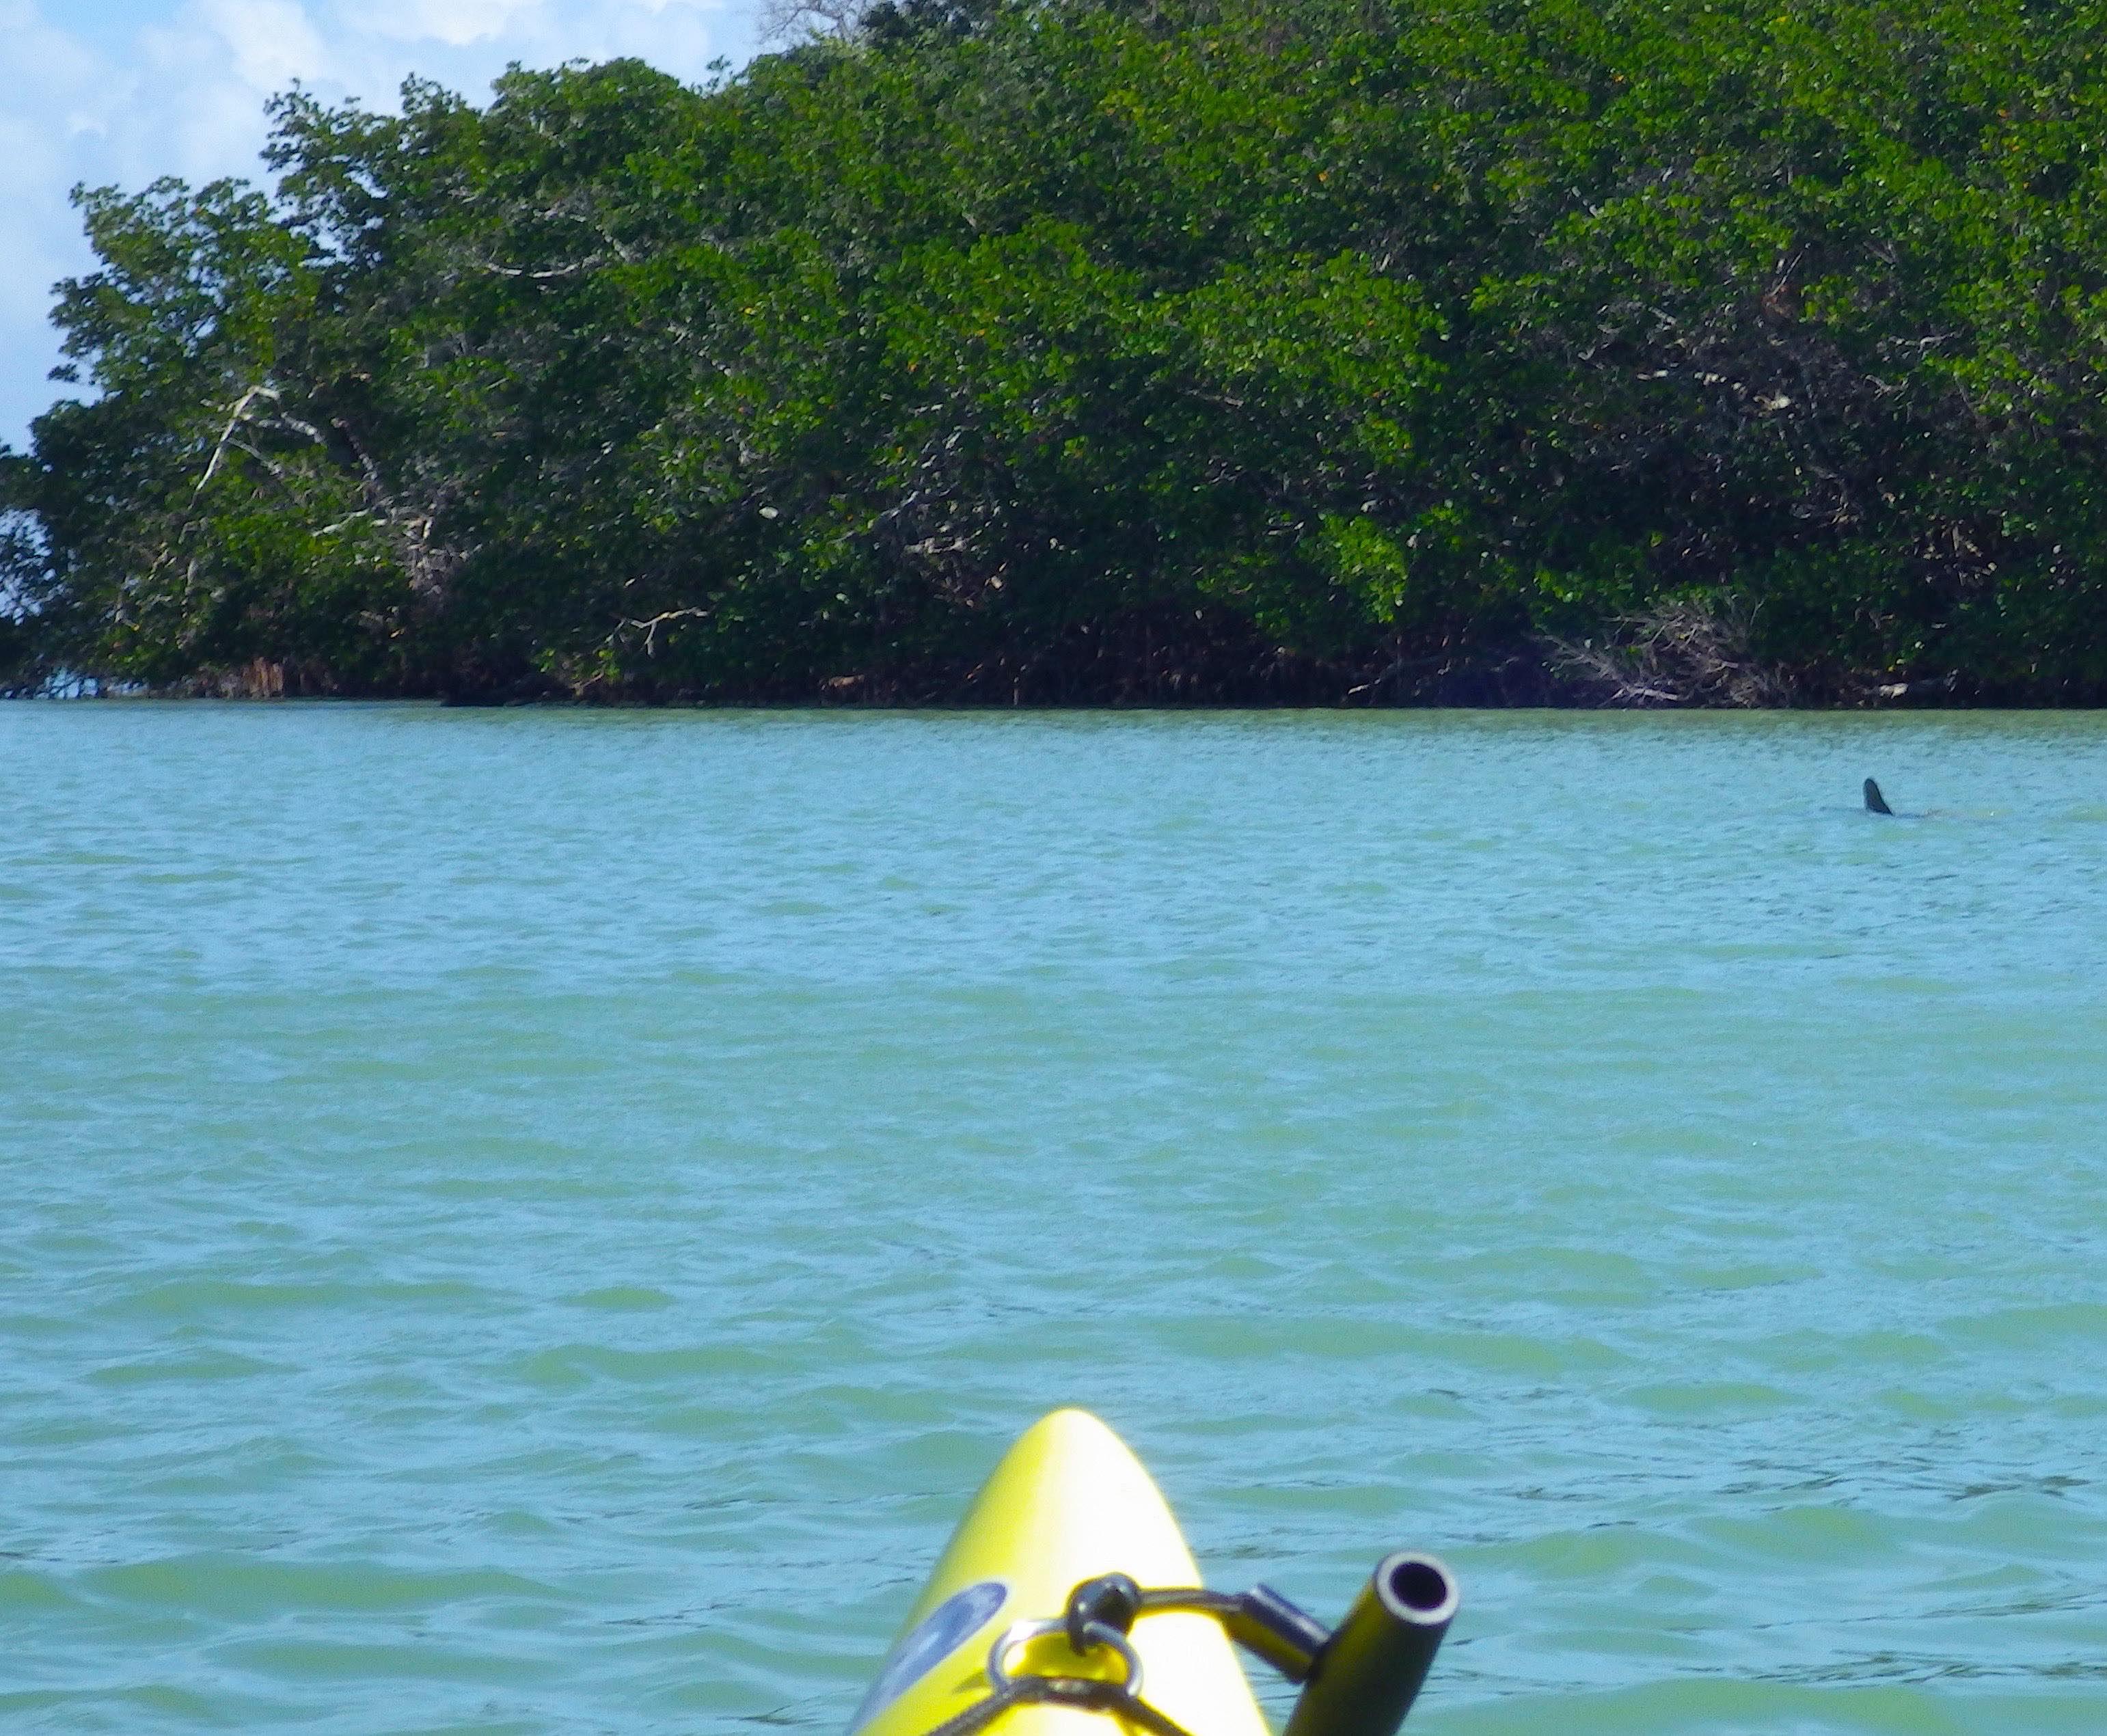 Circumnavigating sanibel island florida wind against current nvjuhfo Image collections